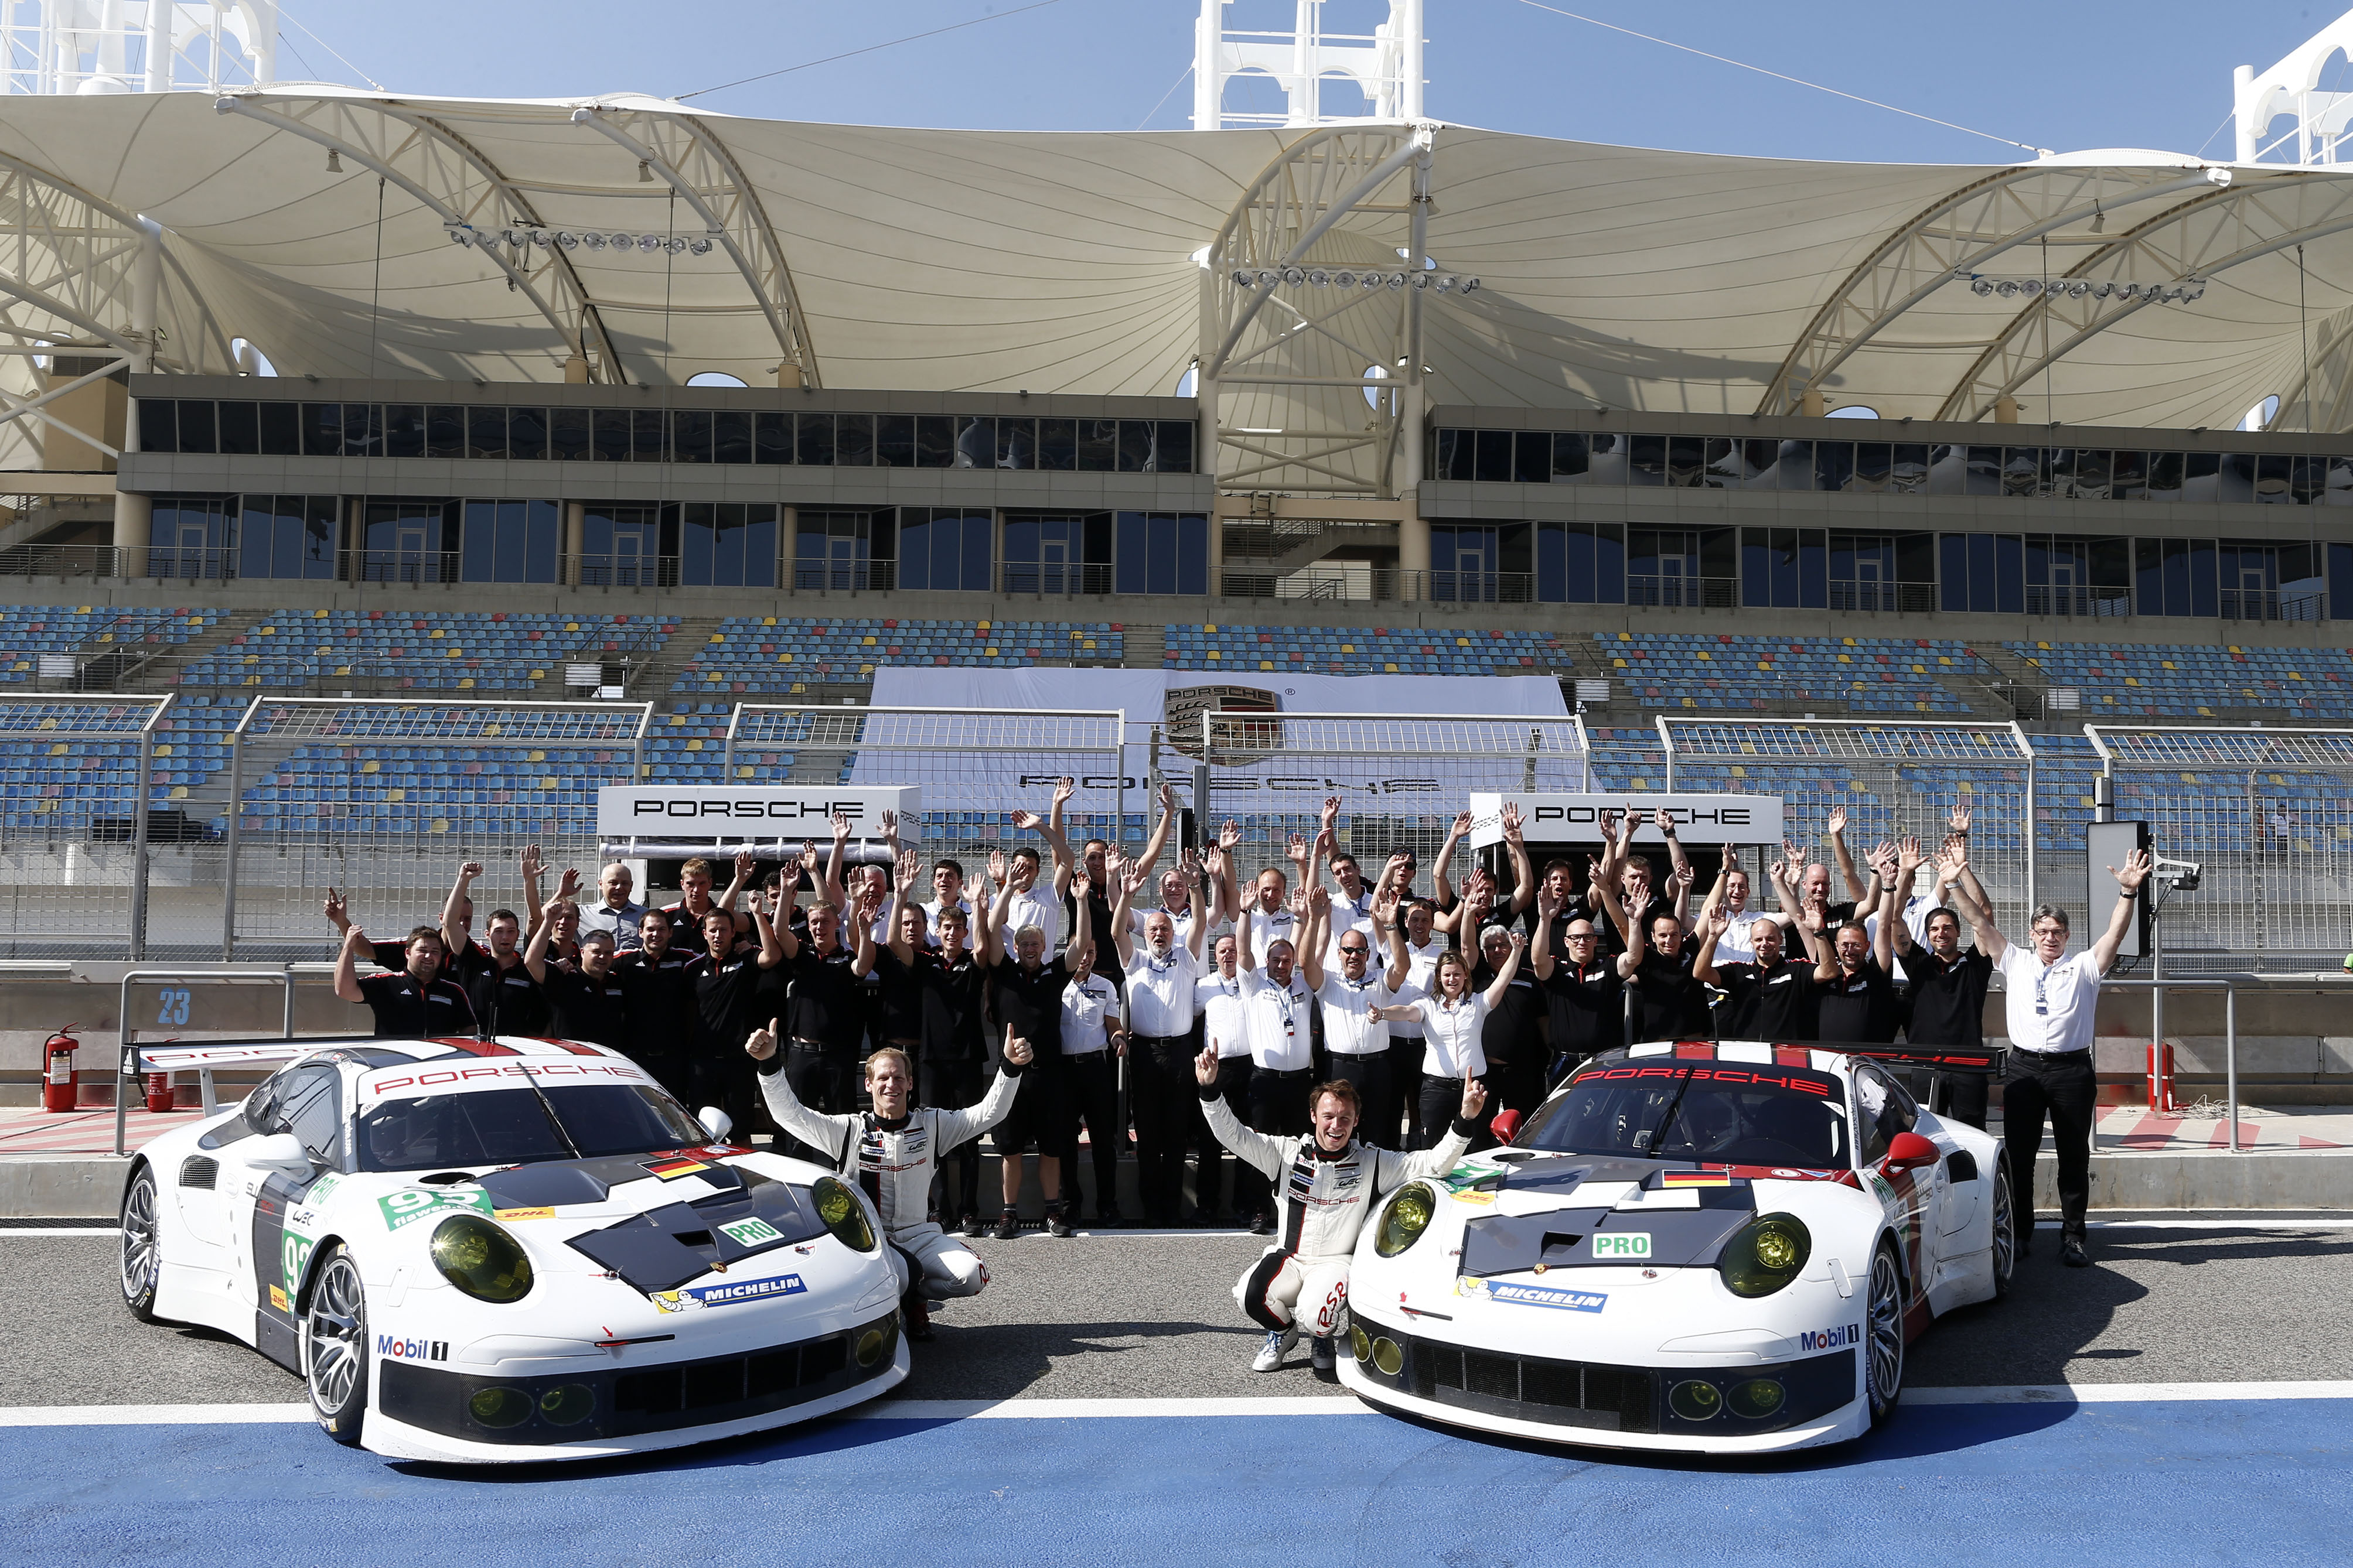 m13_3656_fine Inspiring Porsche 911 Gt1 Road atlanta Cars Trend